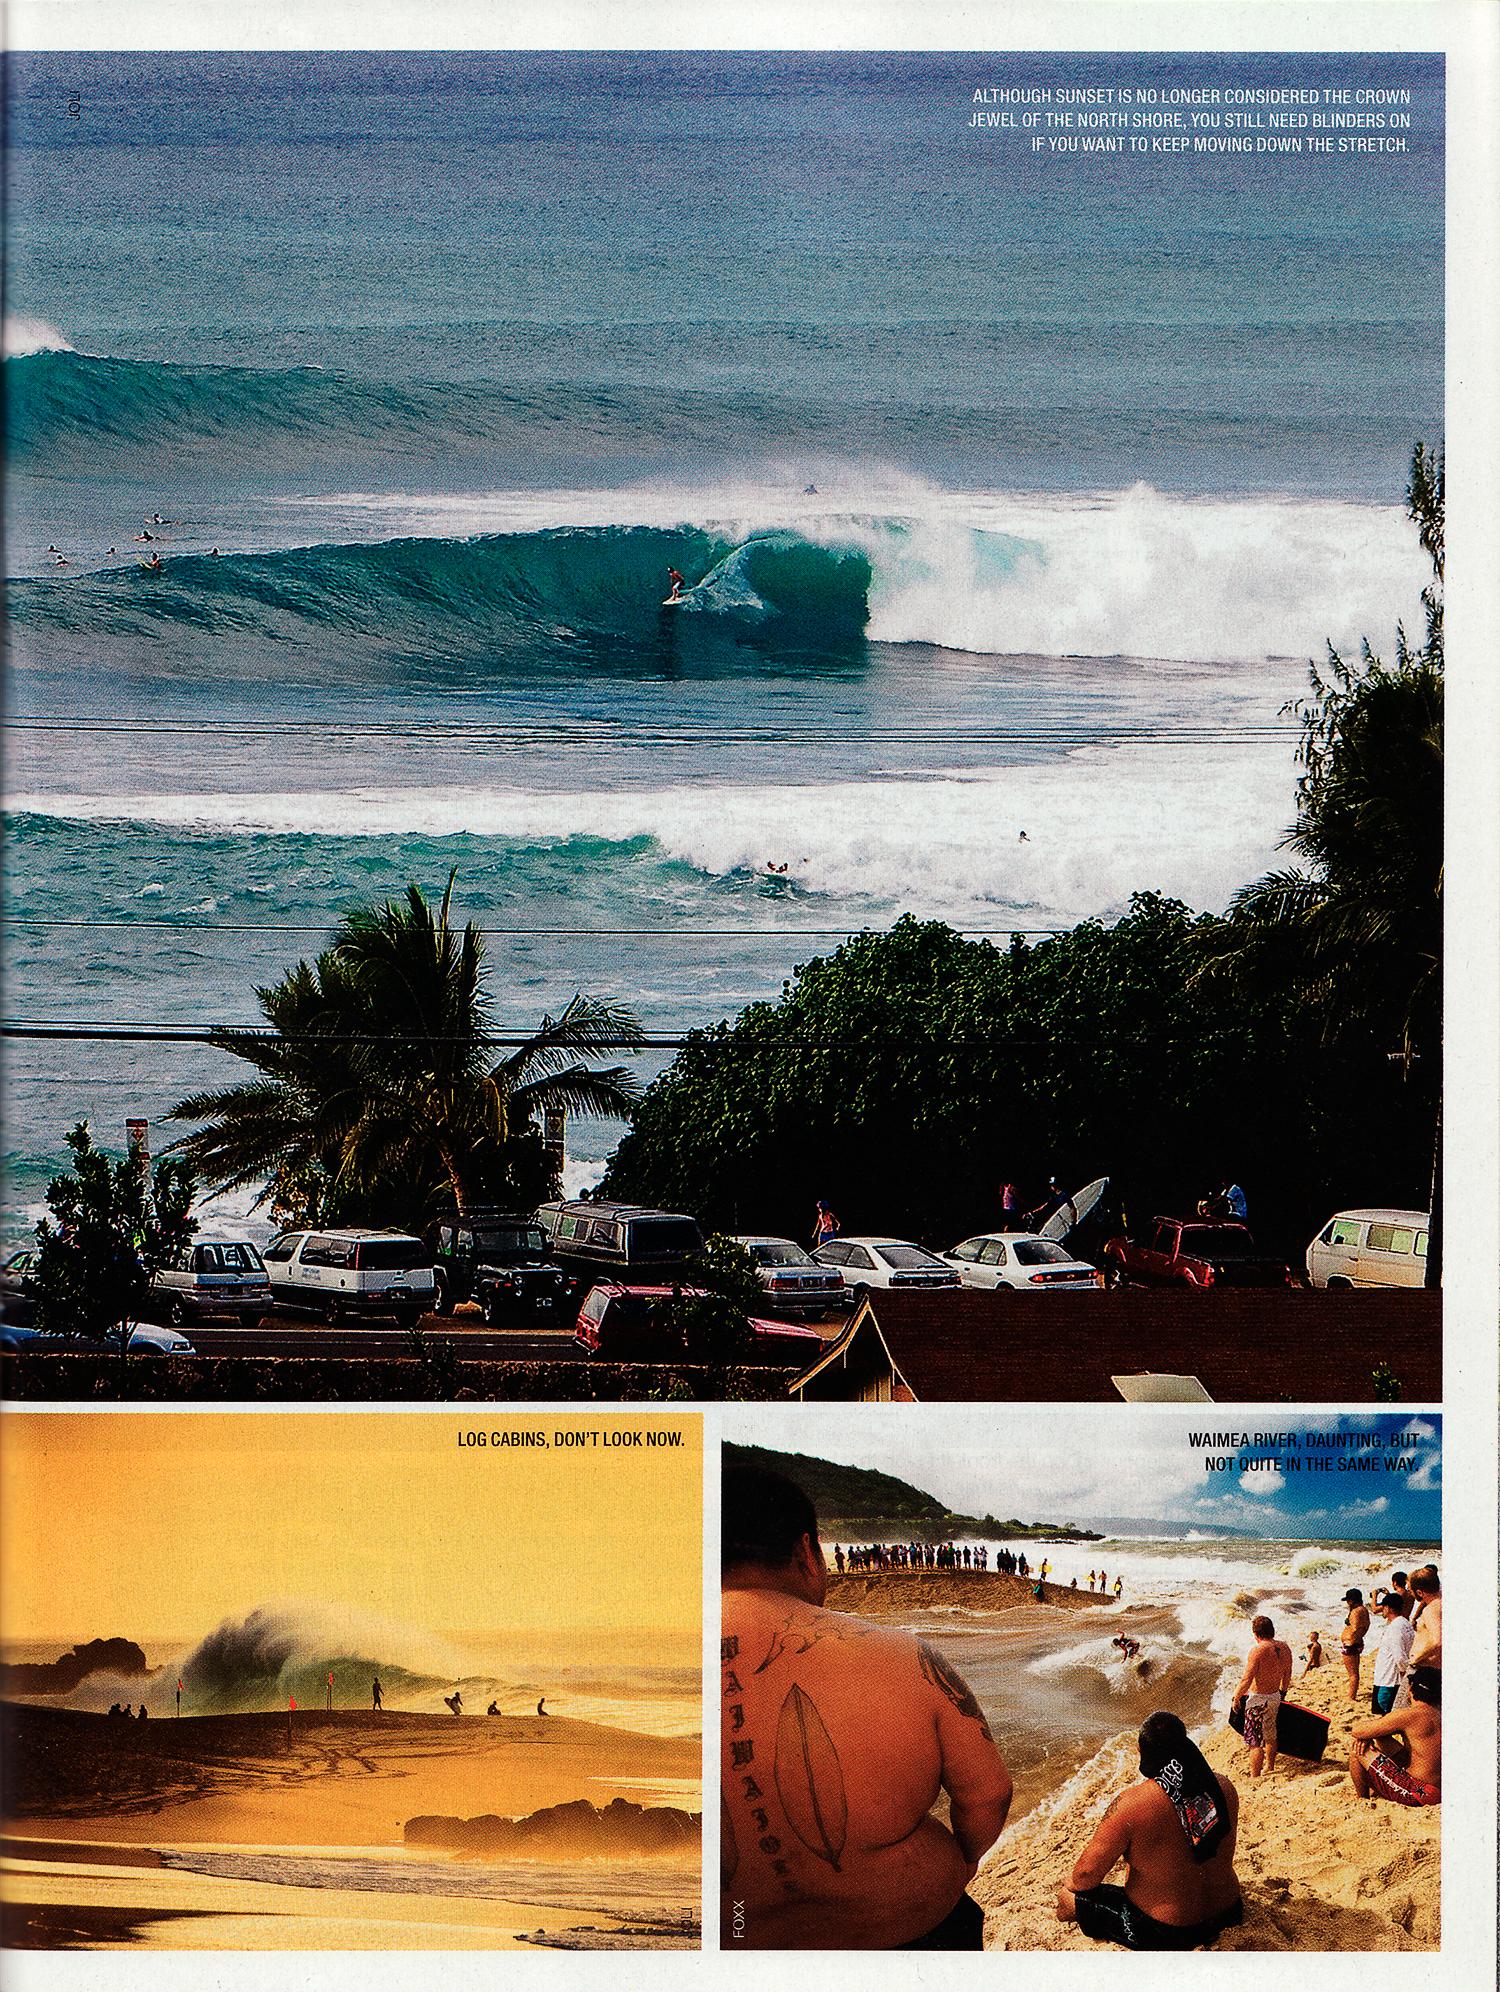 2008-04_Surfer-Inhalt03_A4-300dpi.jpg